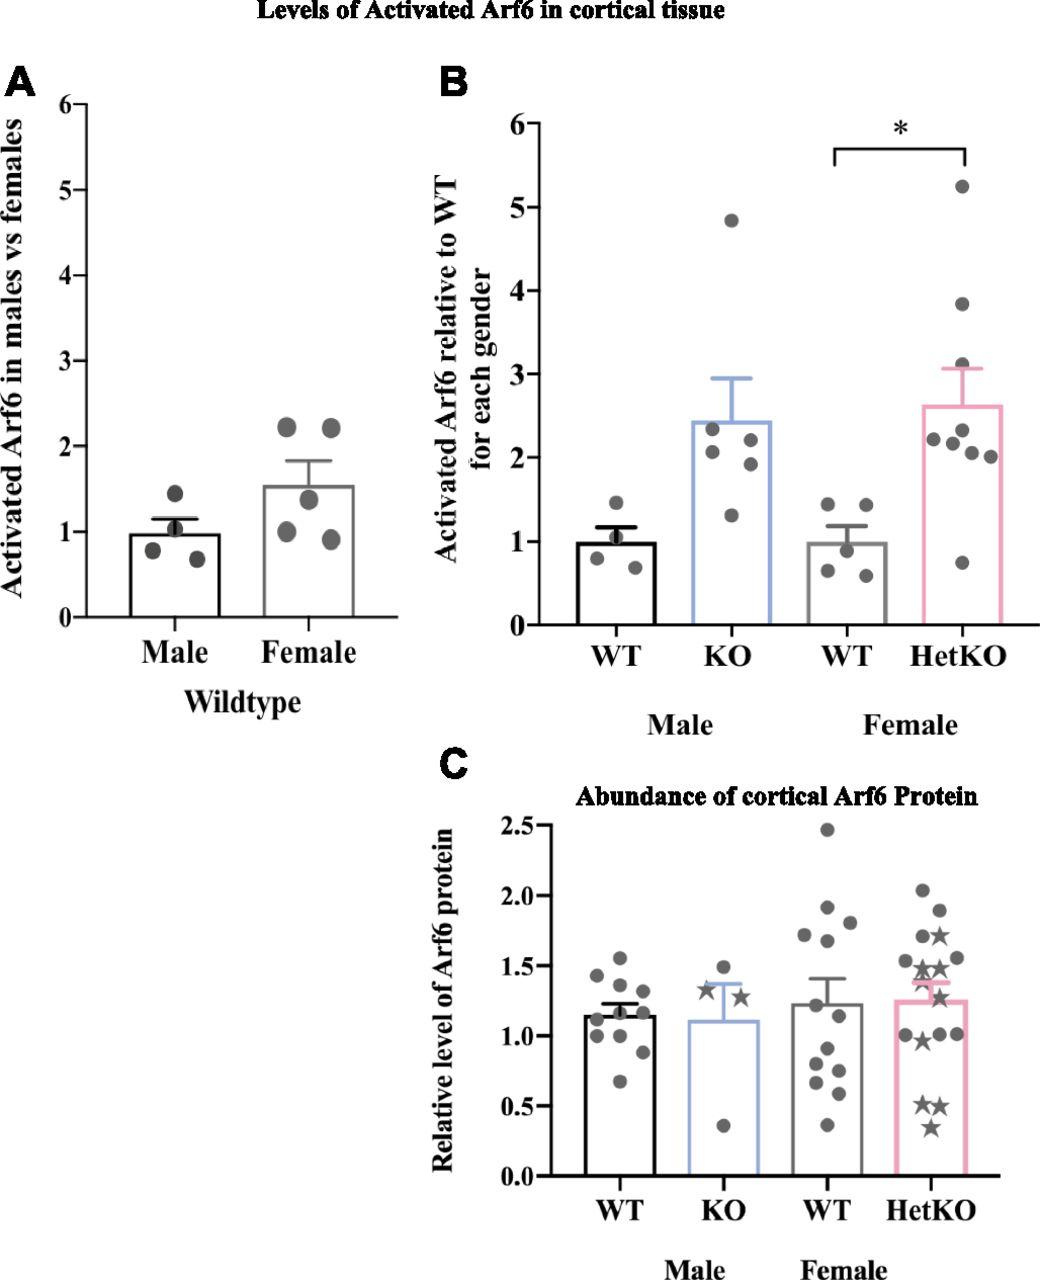 Heterozygous loss of function of IQSEC2/Iqsec2 leads to